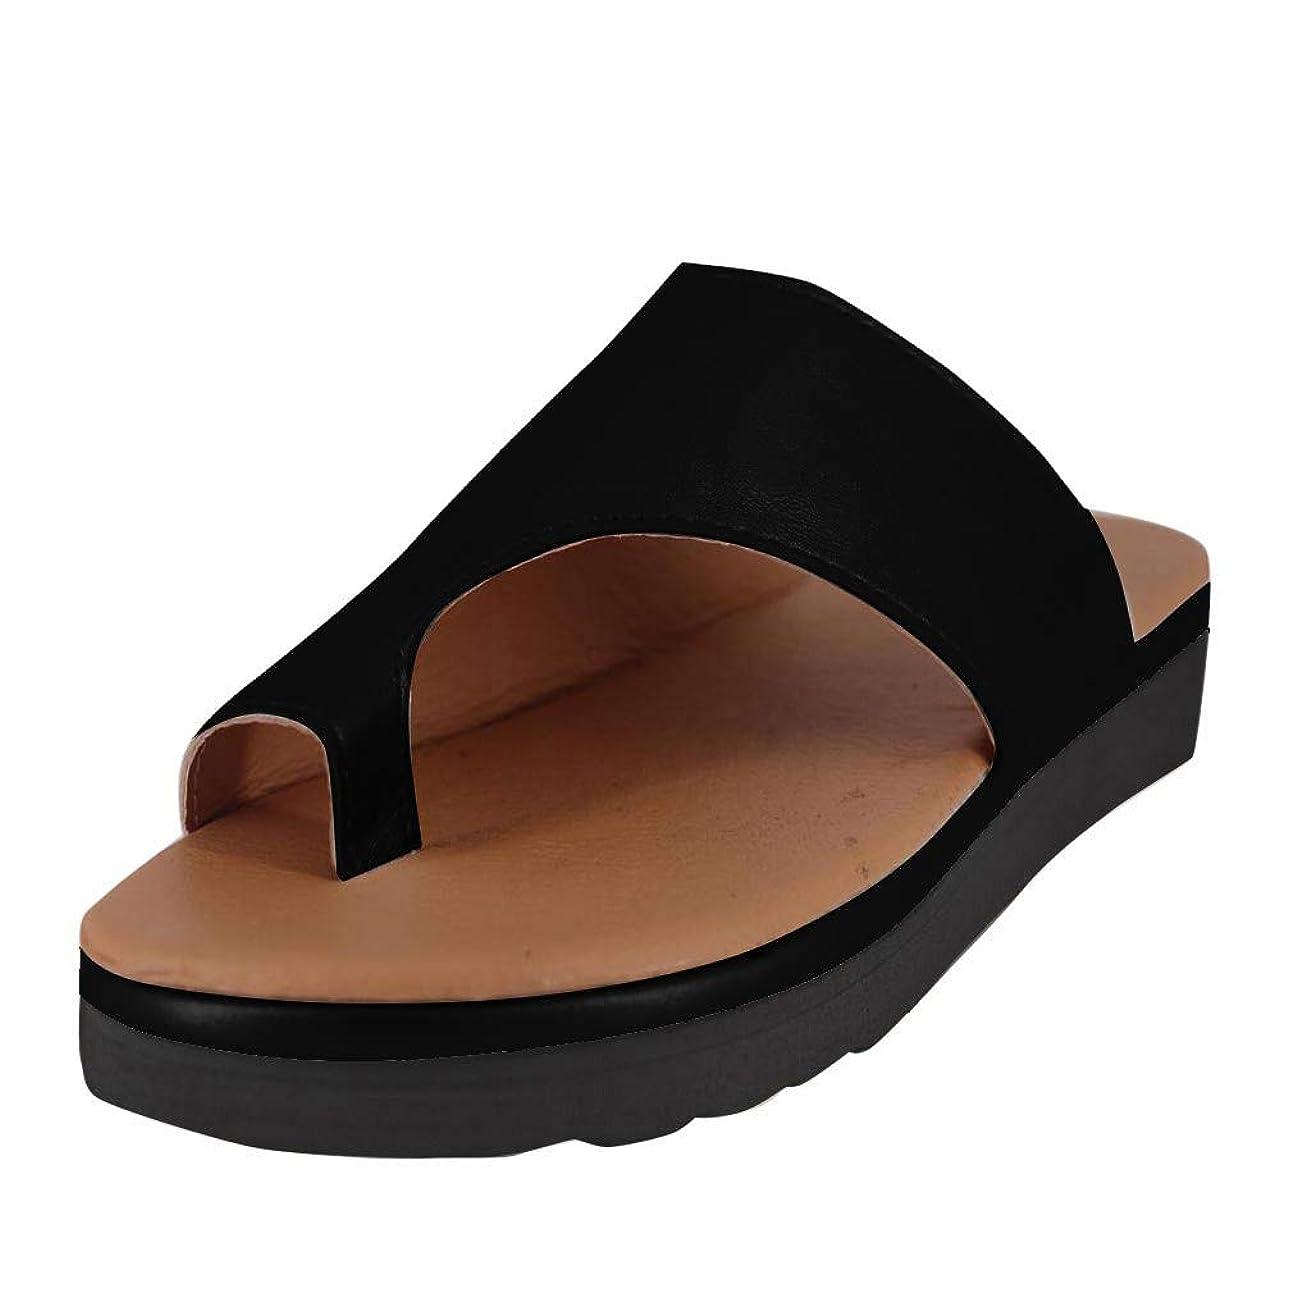 Claystyle Summer Flat Sandals for Women Comfortable Casual Beach Shoes Platform Bohemian Flip Flops Sandals